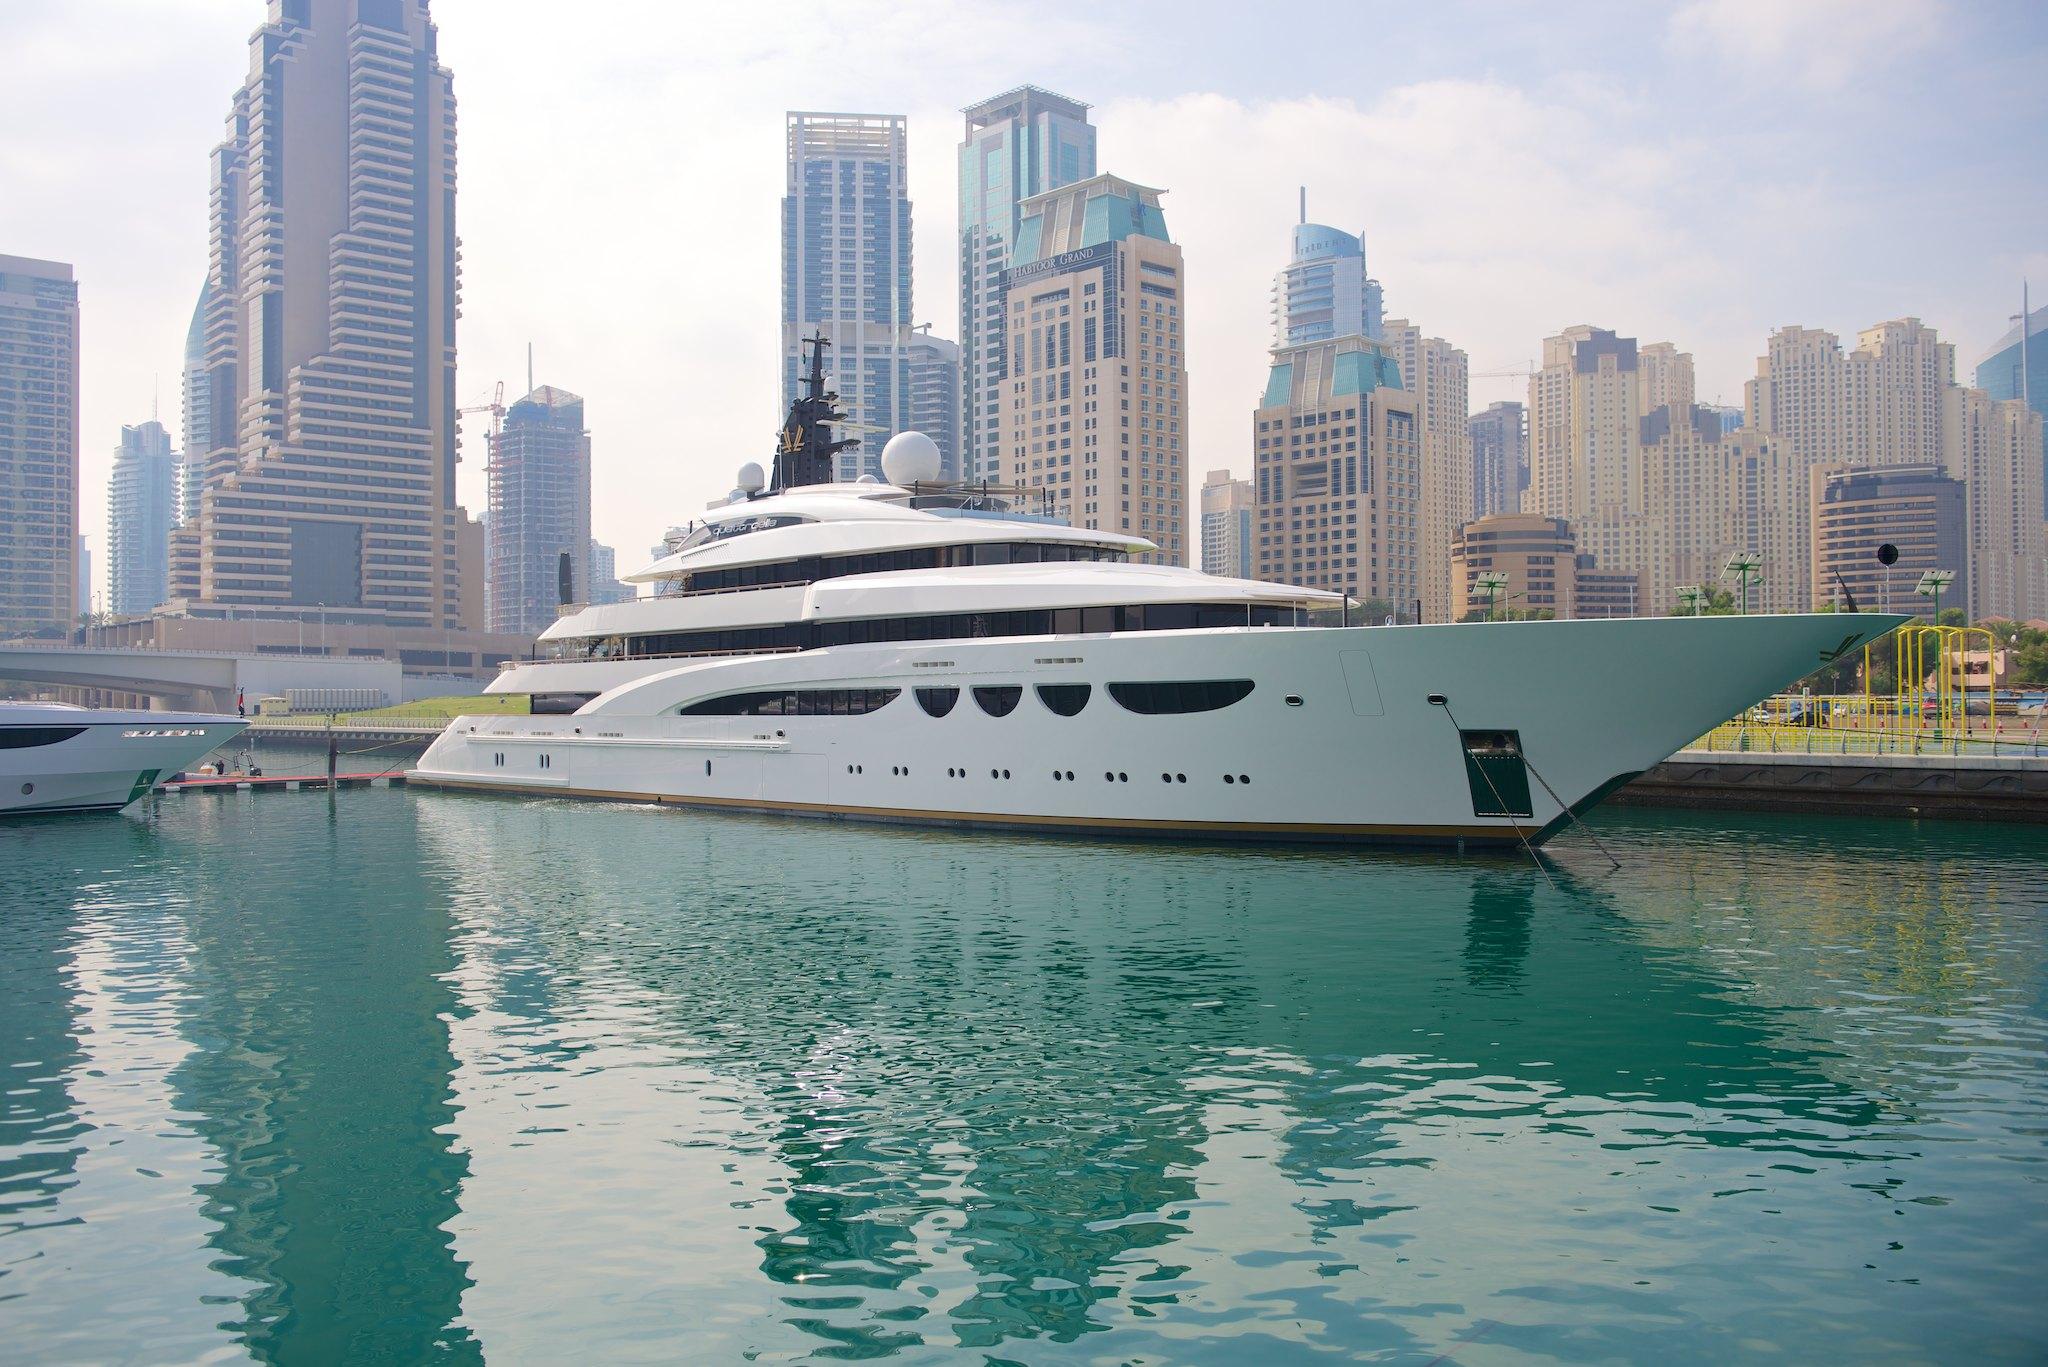 Alquiler de yates en Dubai. Yates baratos de alquiler en Dubai